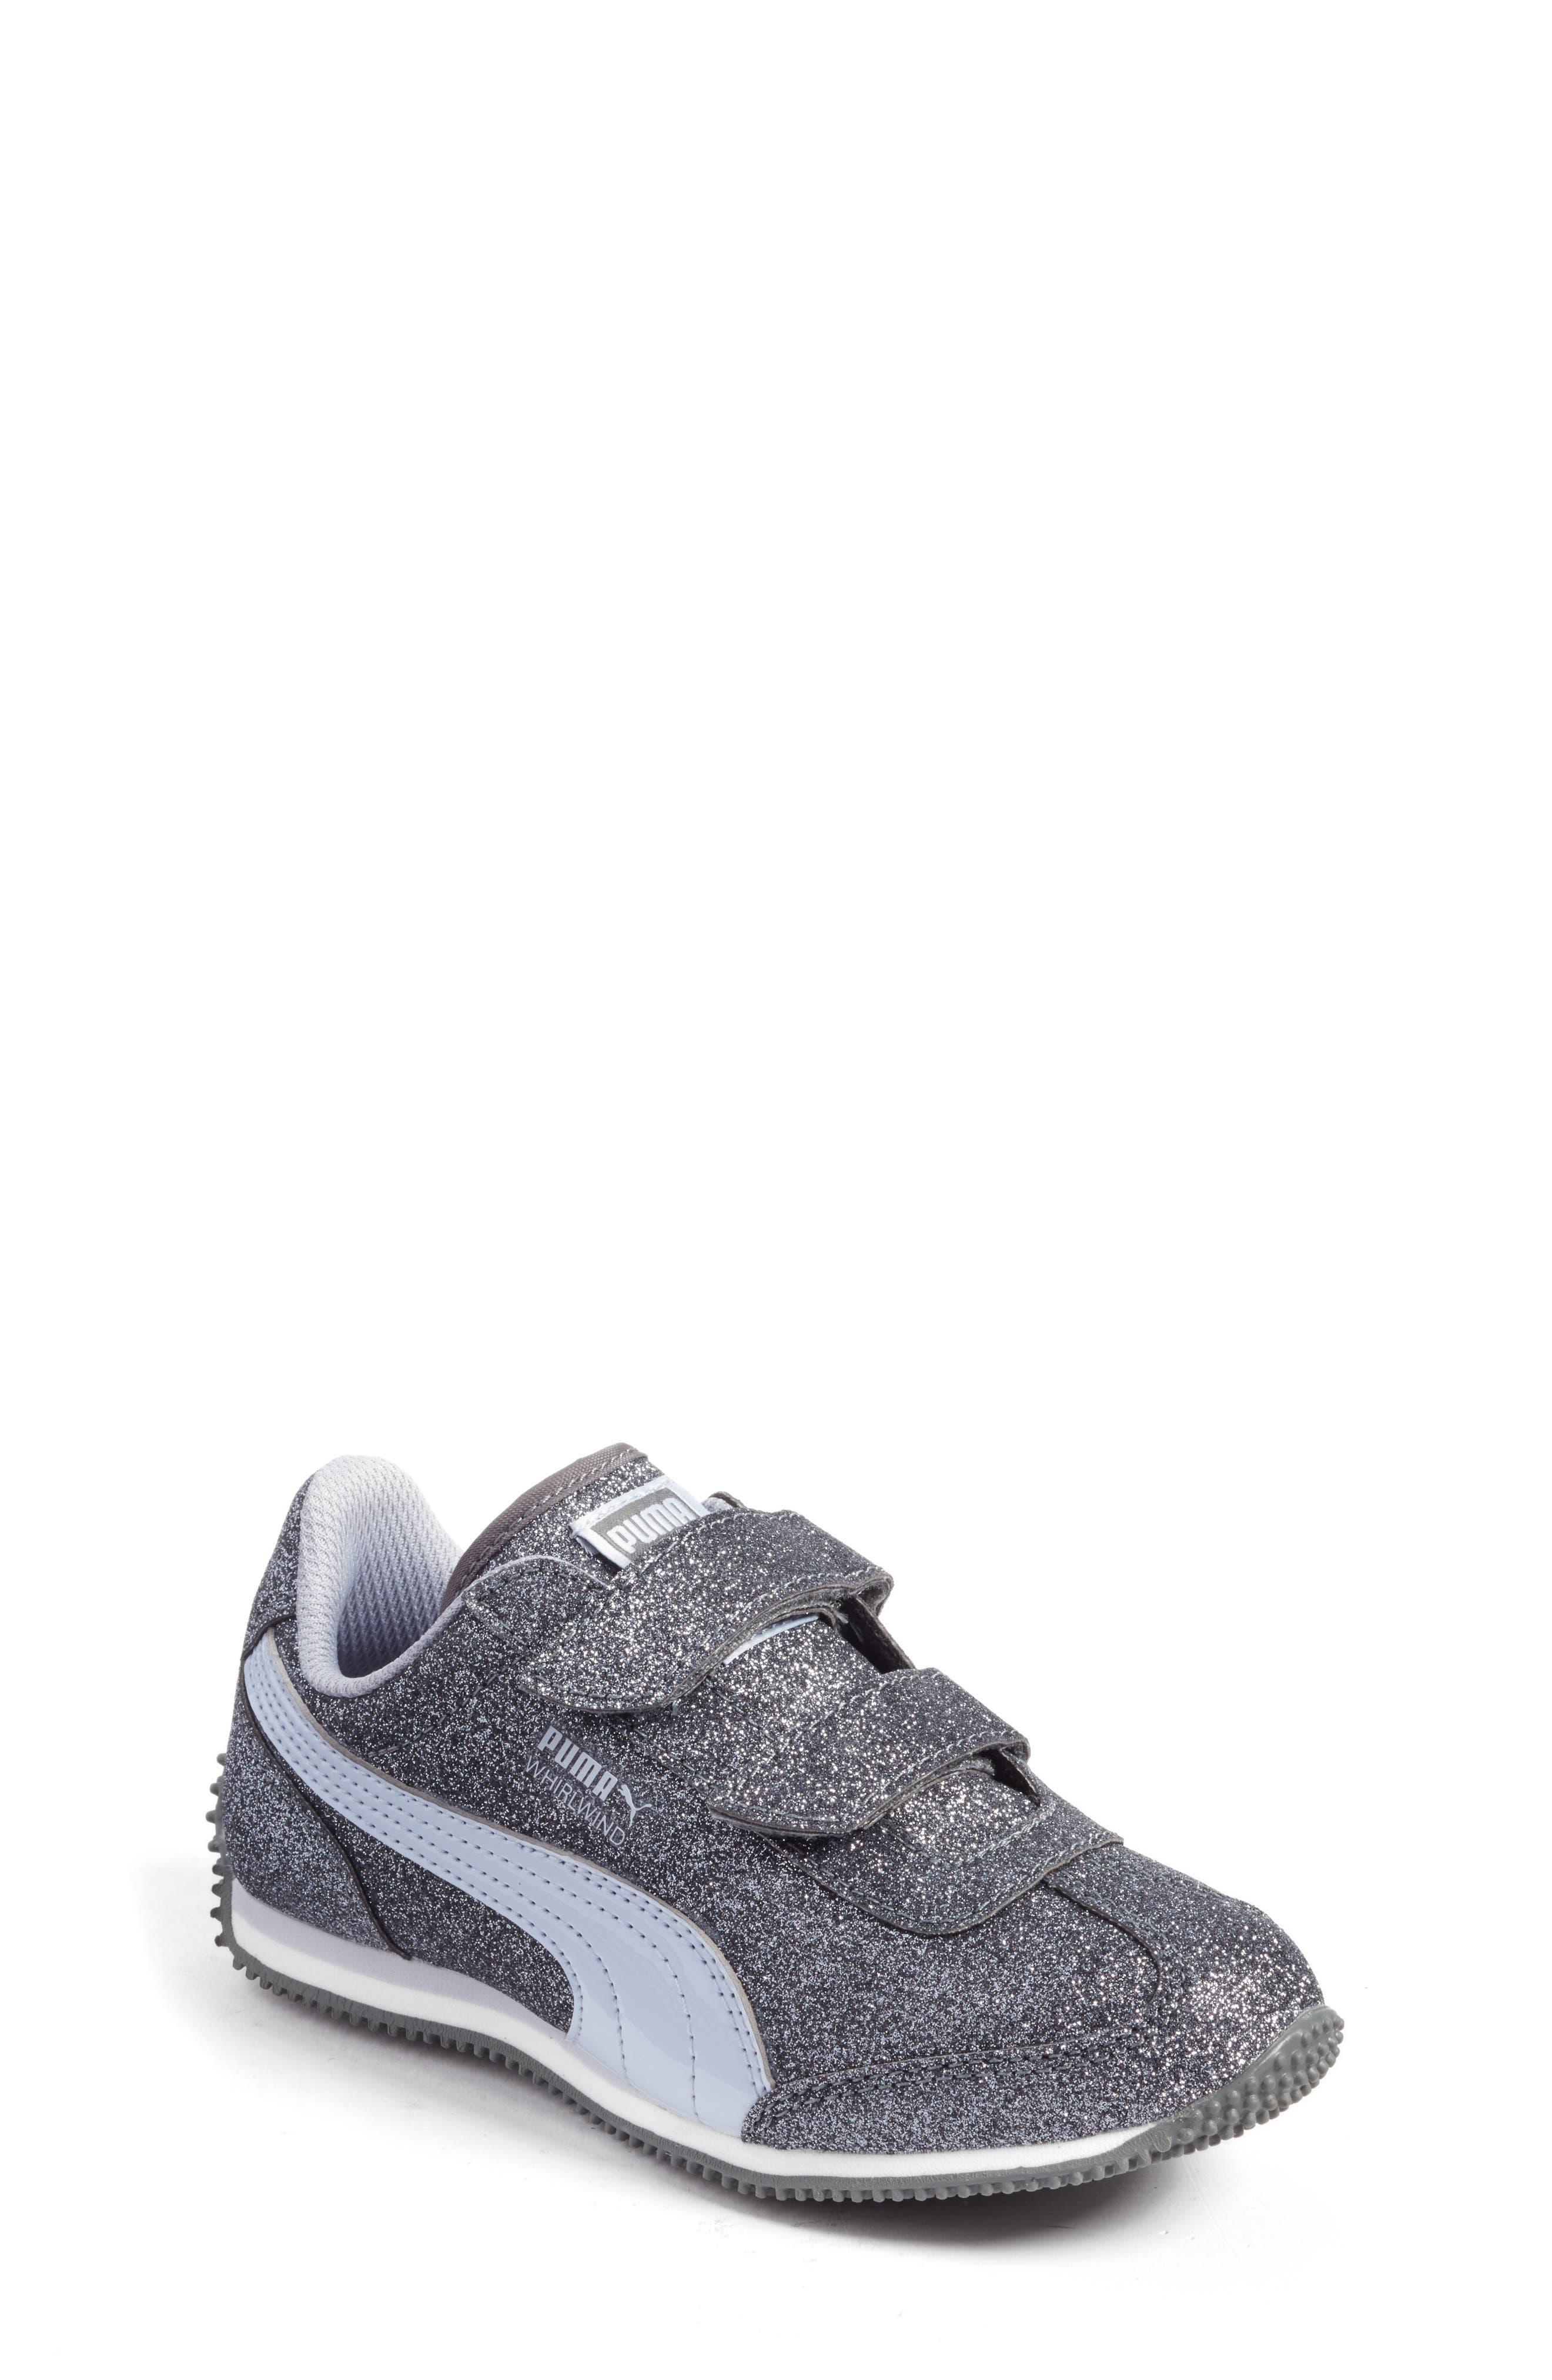 Main Image - PUMA Whirlwind Glitz Sneaker (Baby, Walker & Toddler)